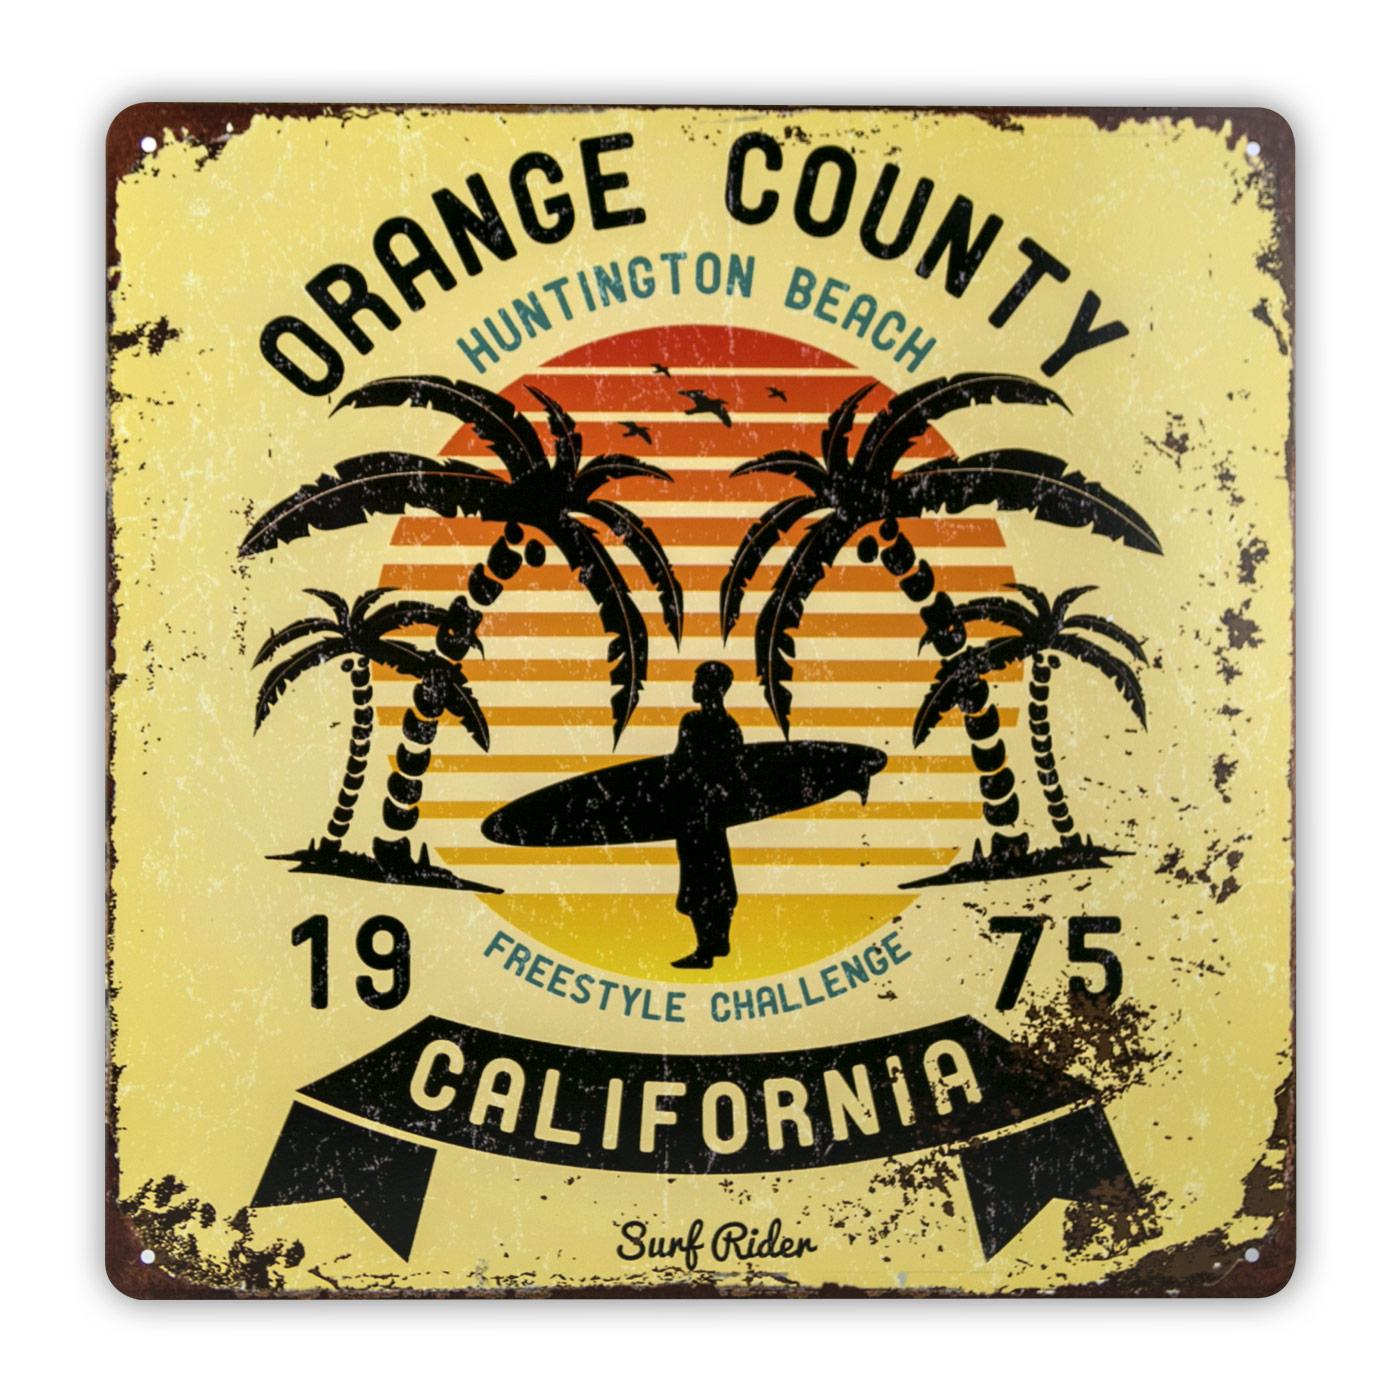 Plaque métal surf rider orange county